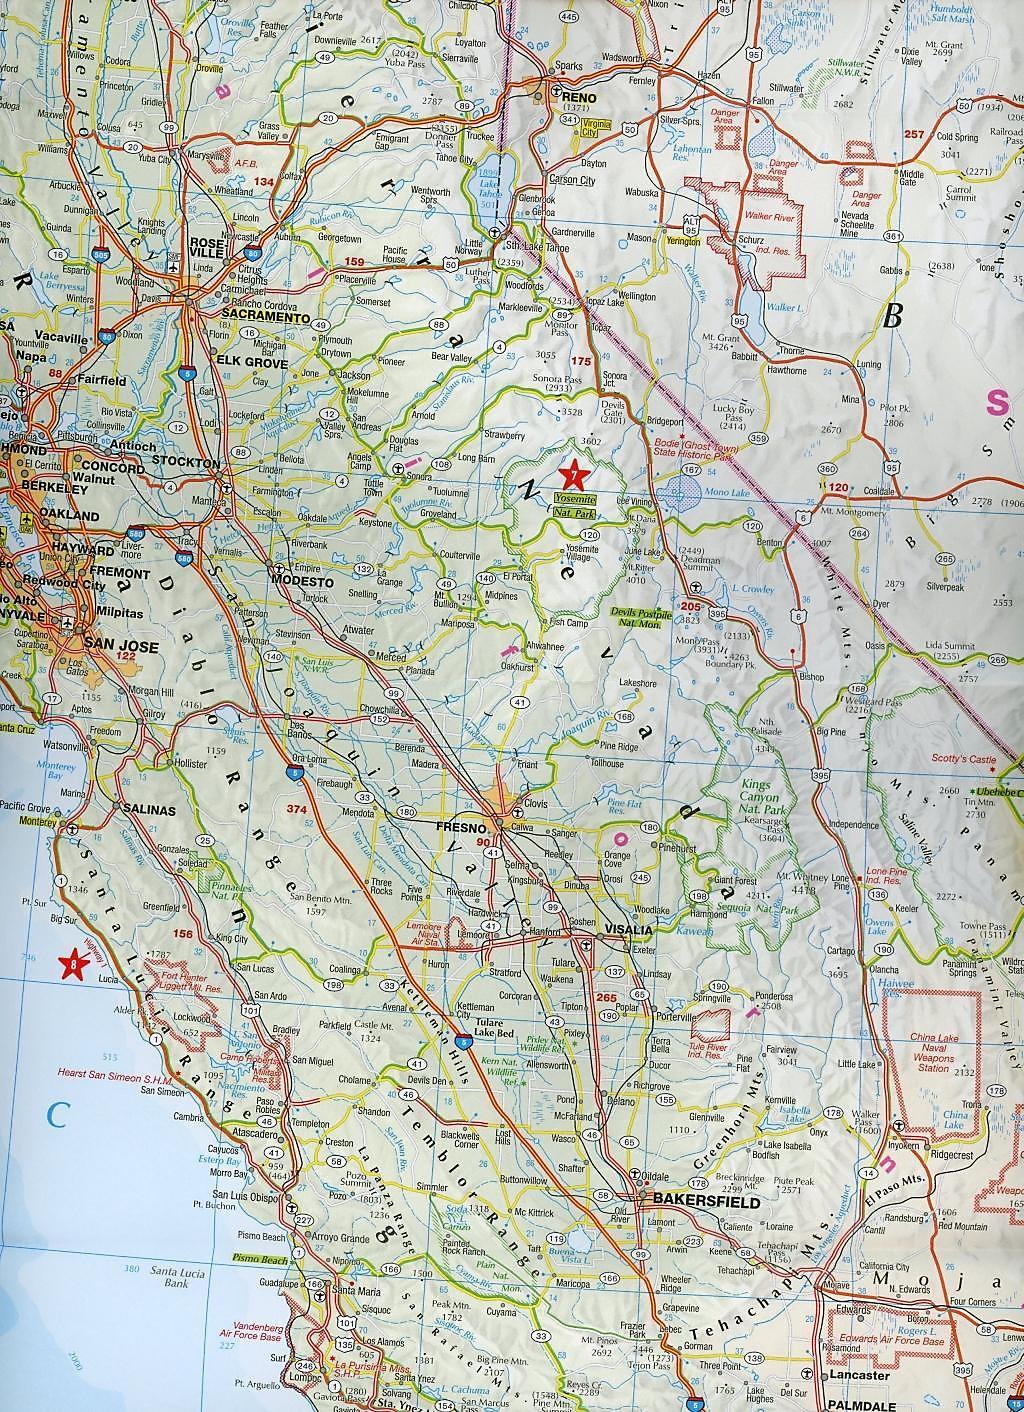 Karte Usa Westen.Marco Polo Kontinentalkarte Usa West 1 2 000 000 Buch Portofrei